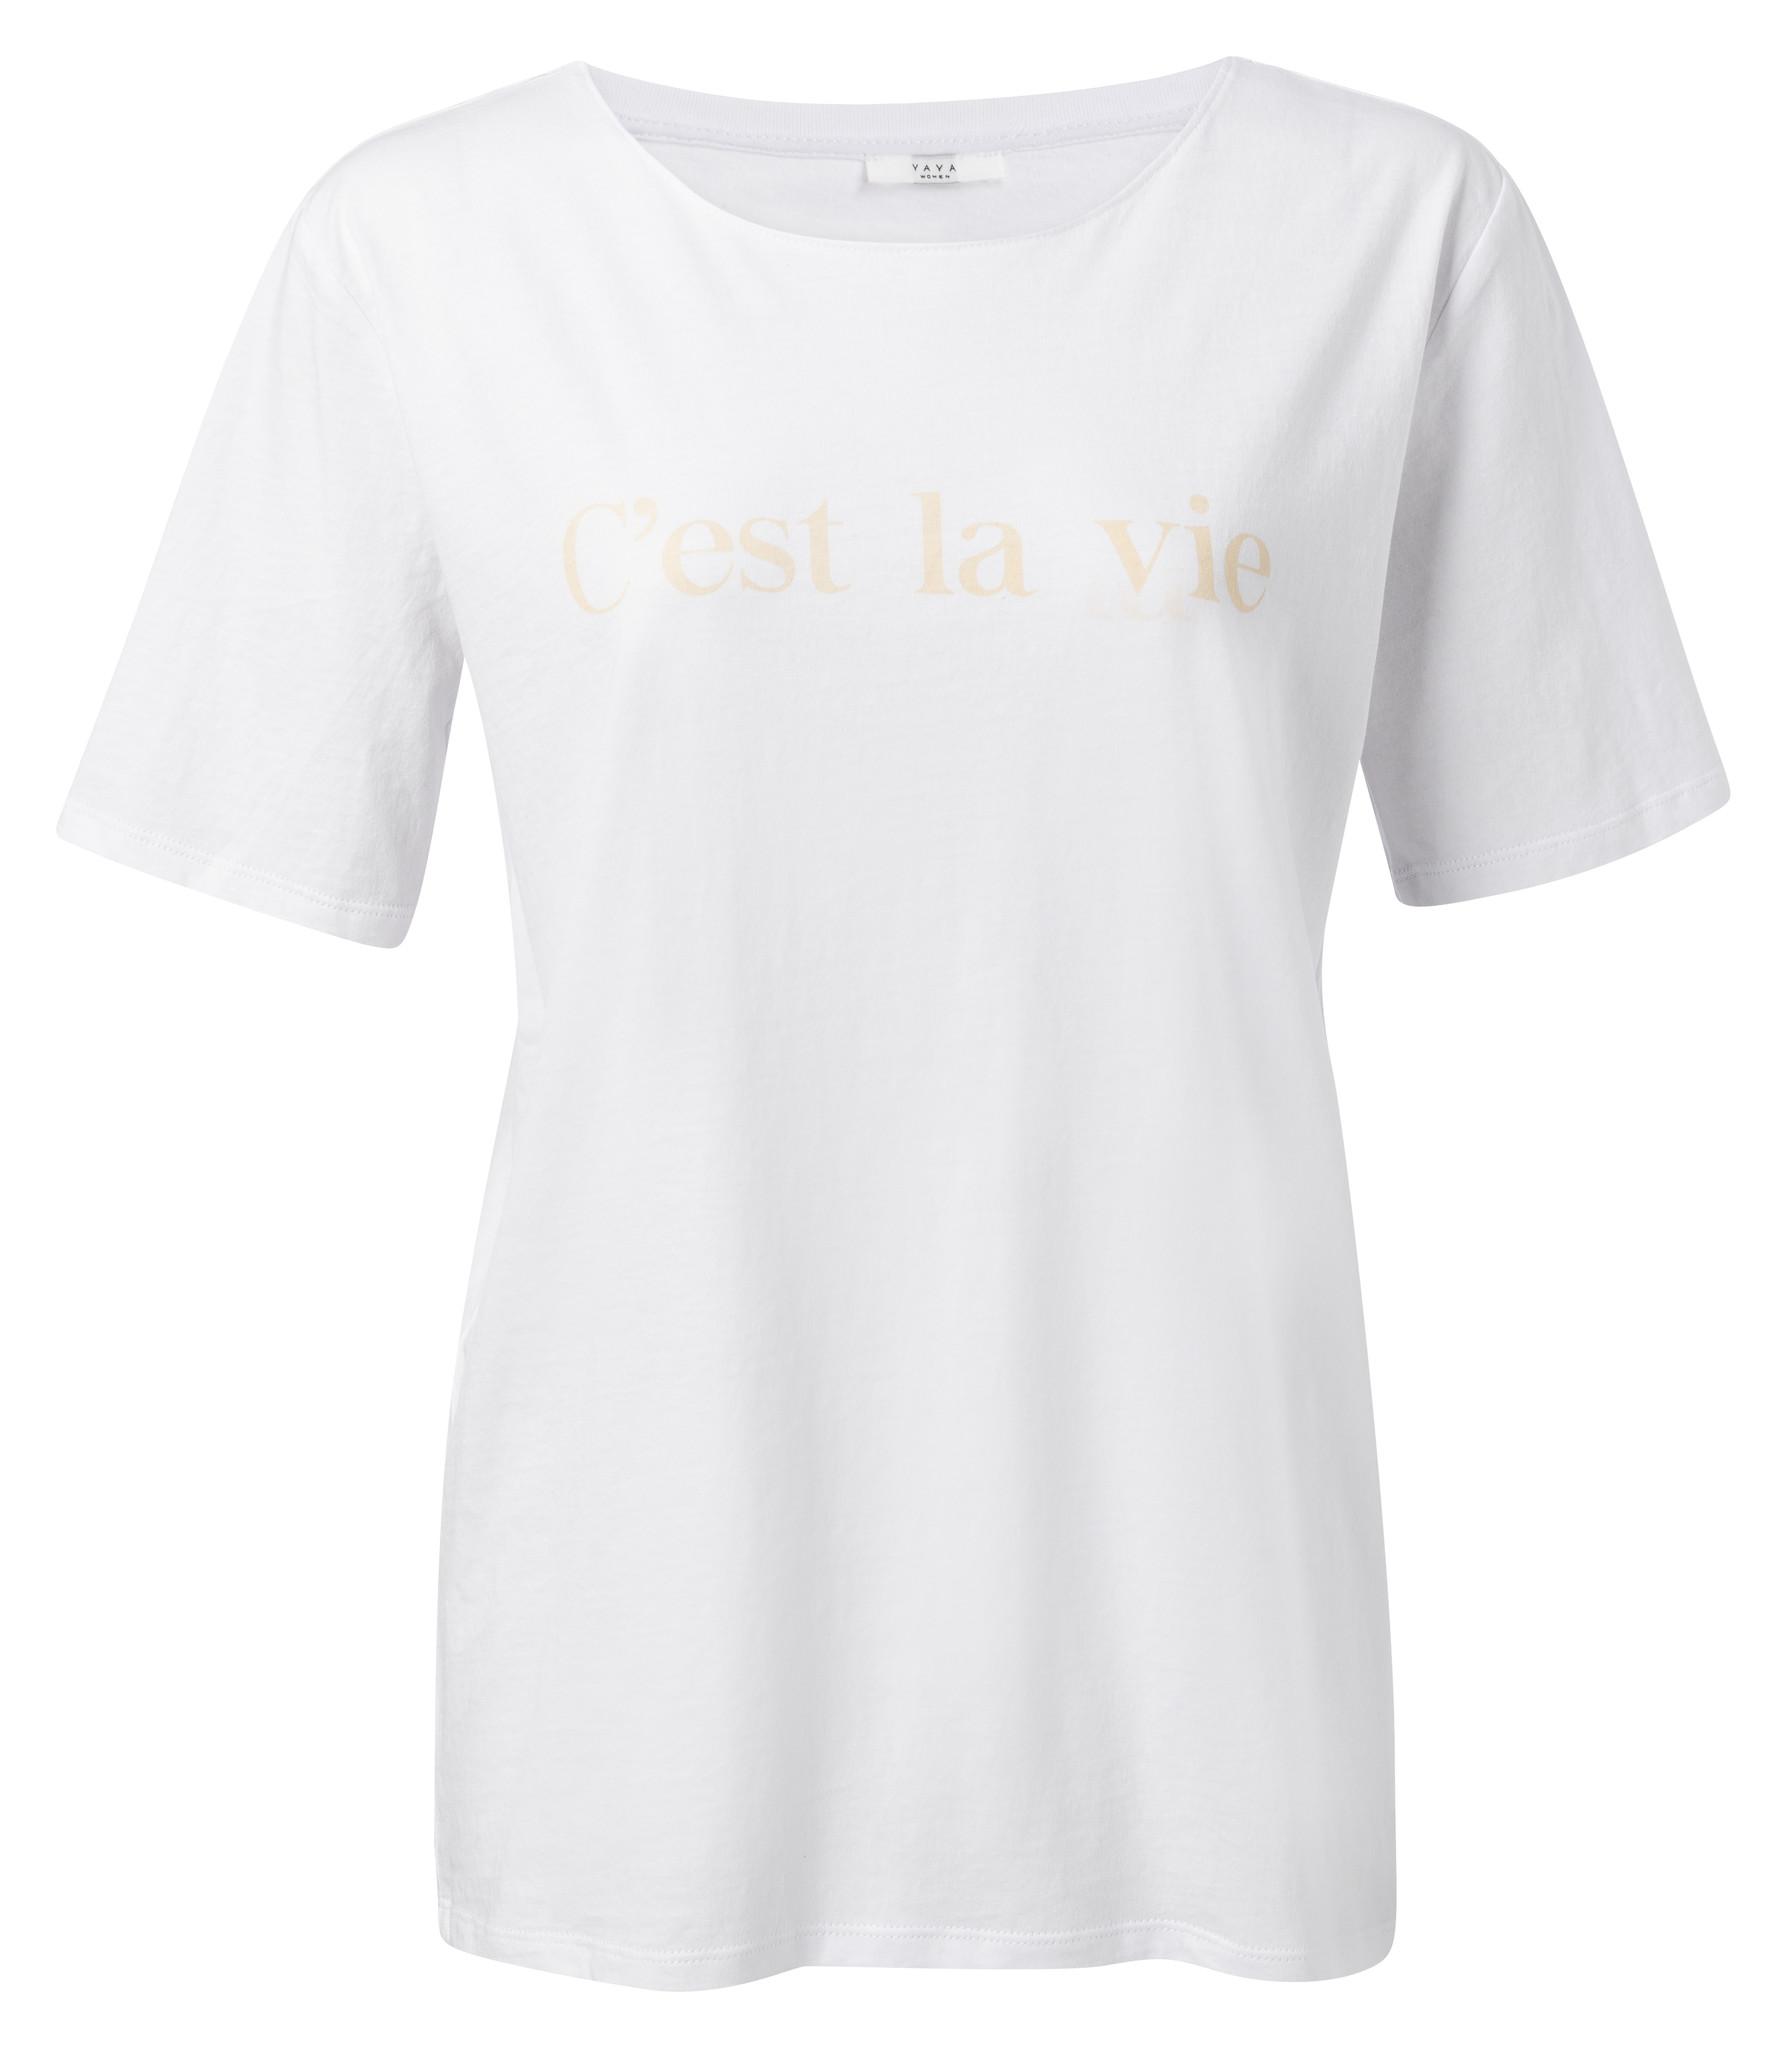 yaya Cotton T-shirt with 1919139-014-1